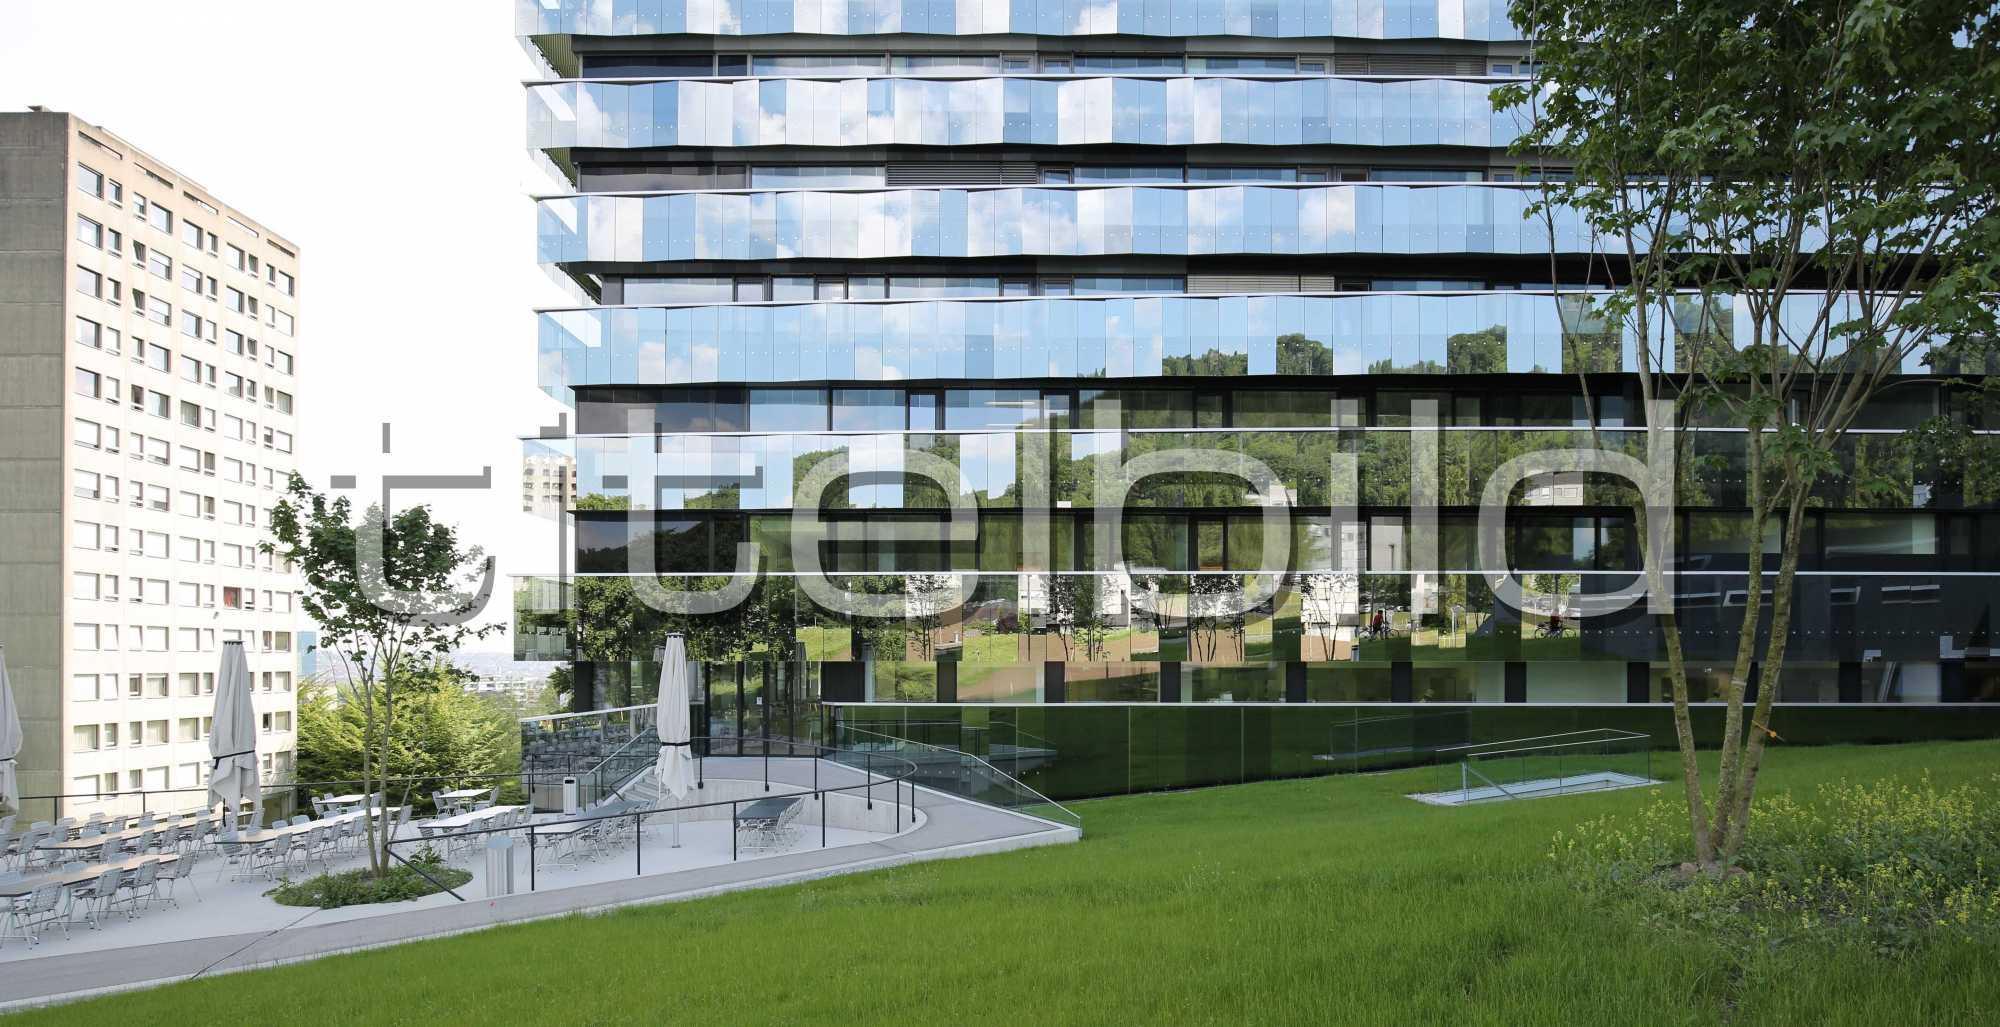 Projektbild-Nr. 6: Bettenhaus Triemli-Spital